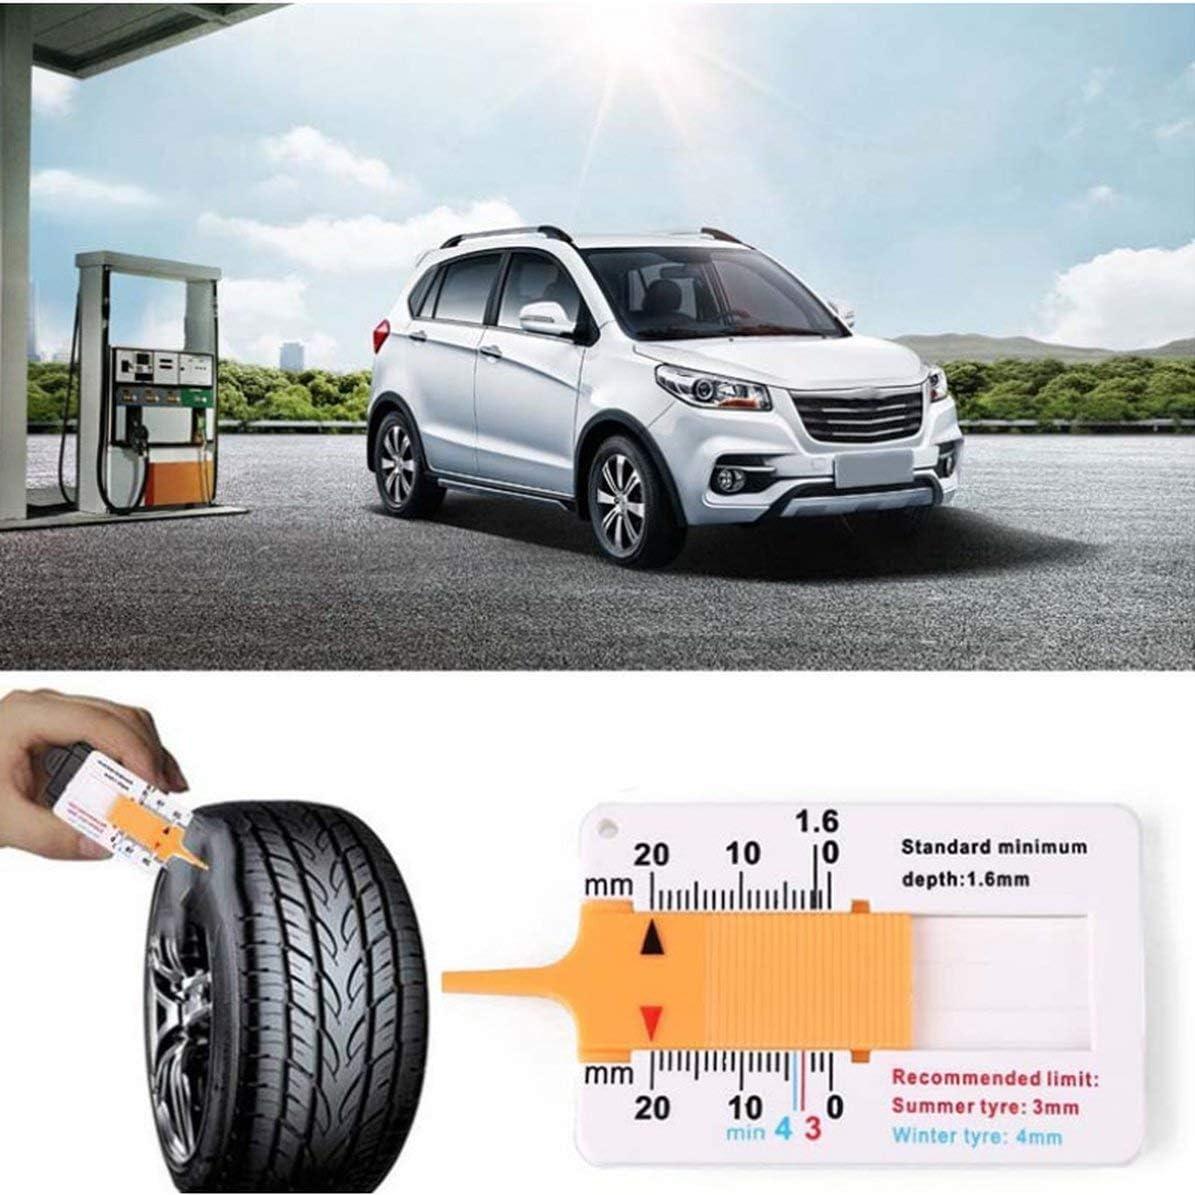 Measure Tool Tyre Tread Depth Gauge Tread Depth Meter for Car Trailer Motorcycle Caravan Trailer Wheel Car Accessories MarinoBIRD